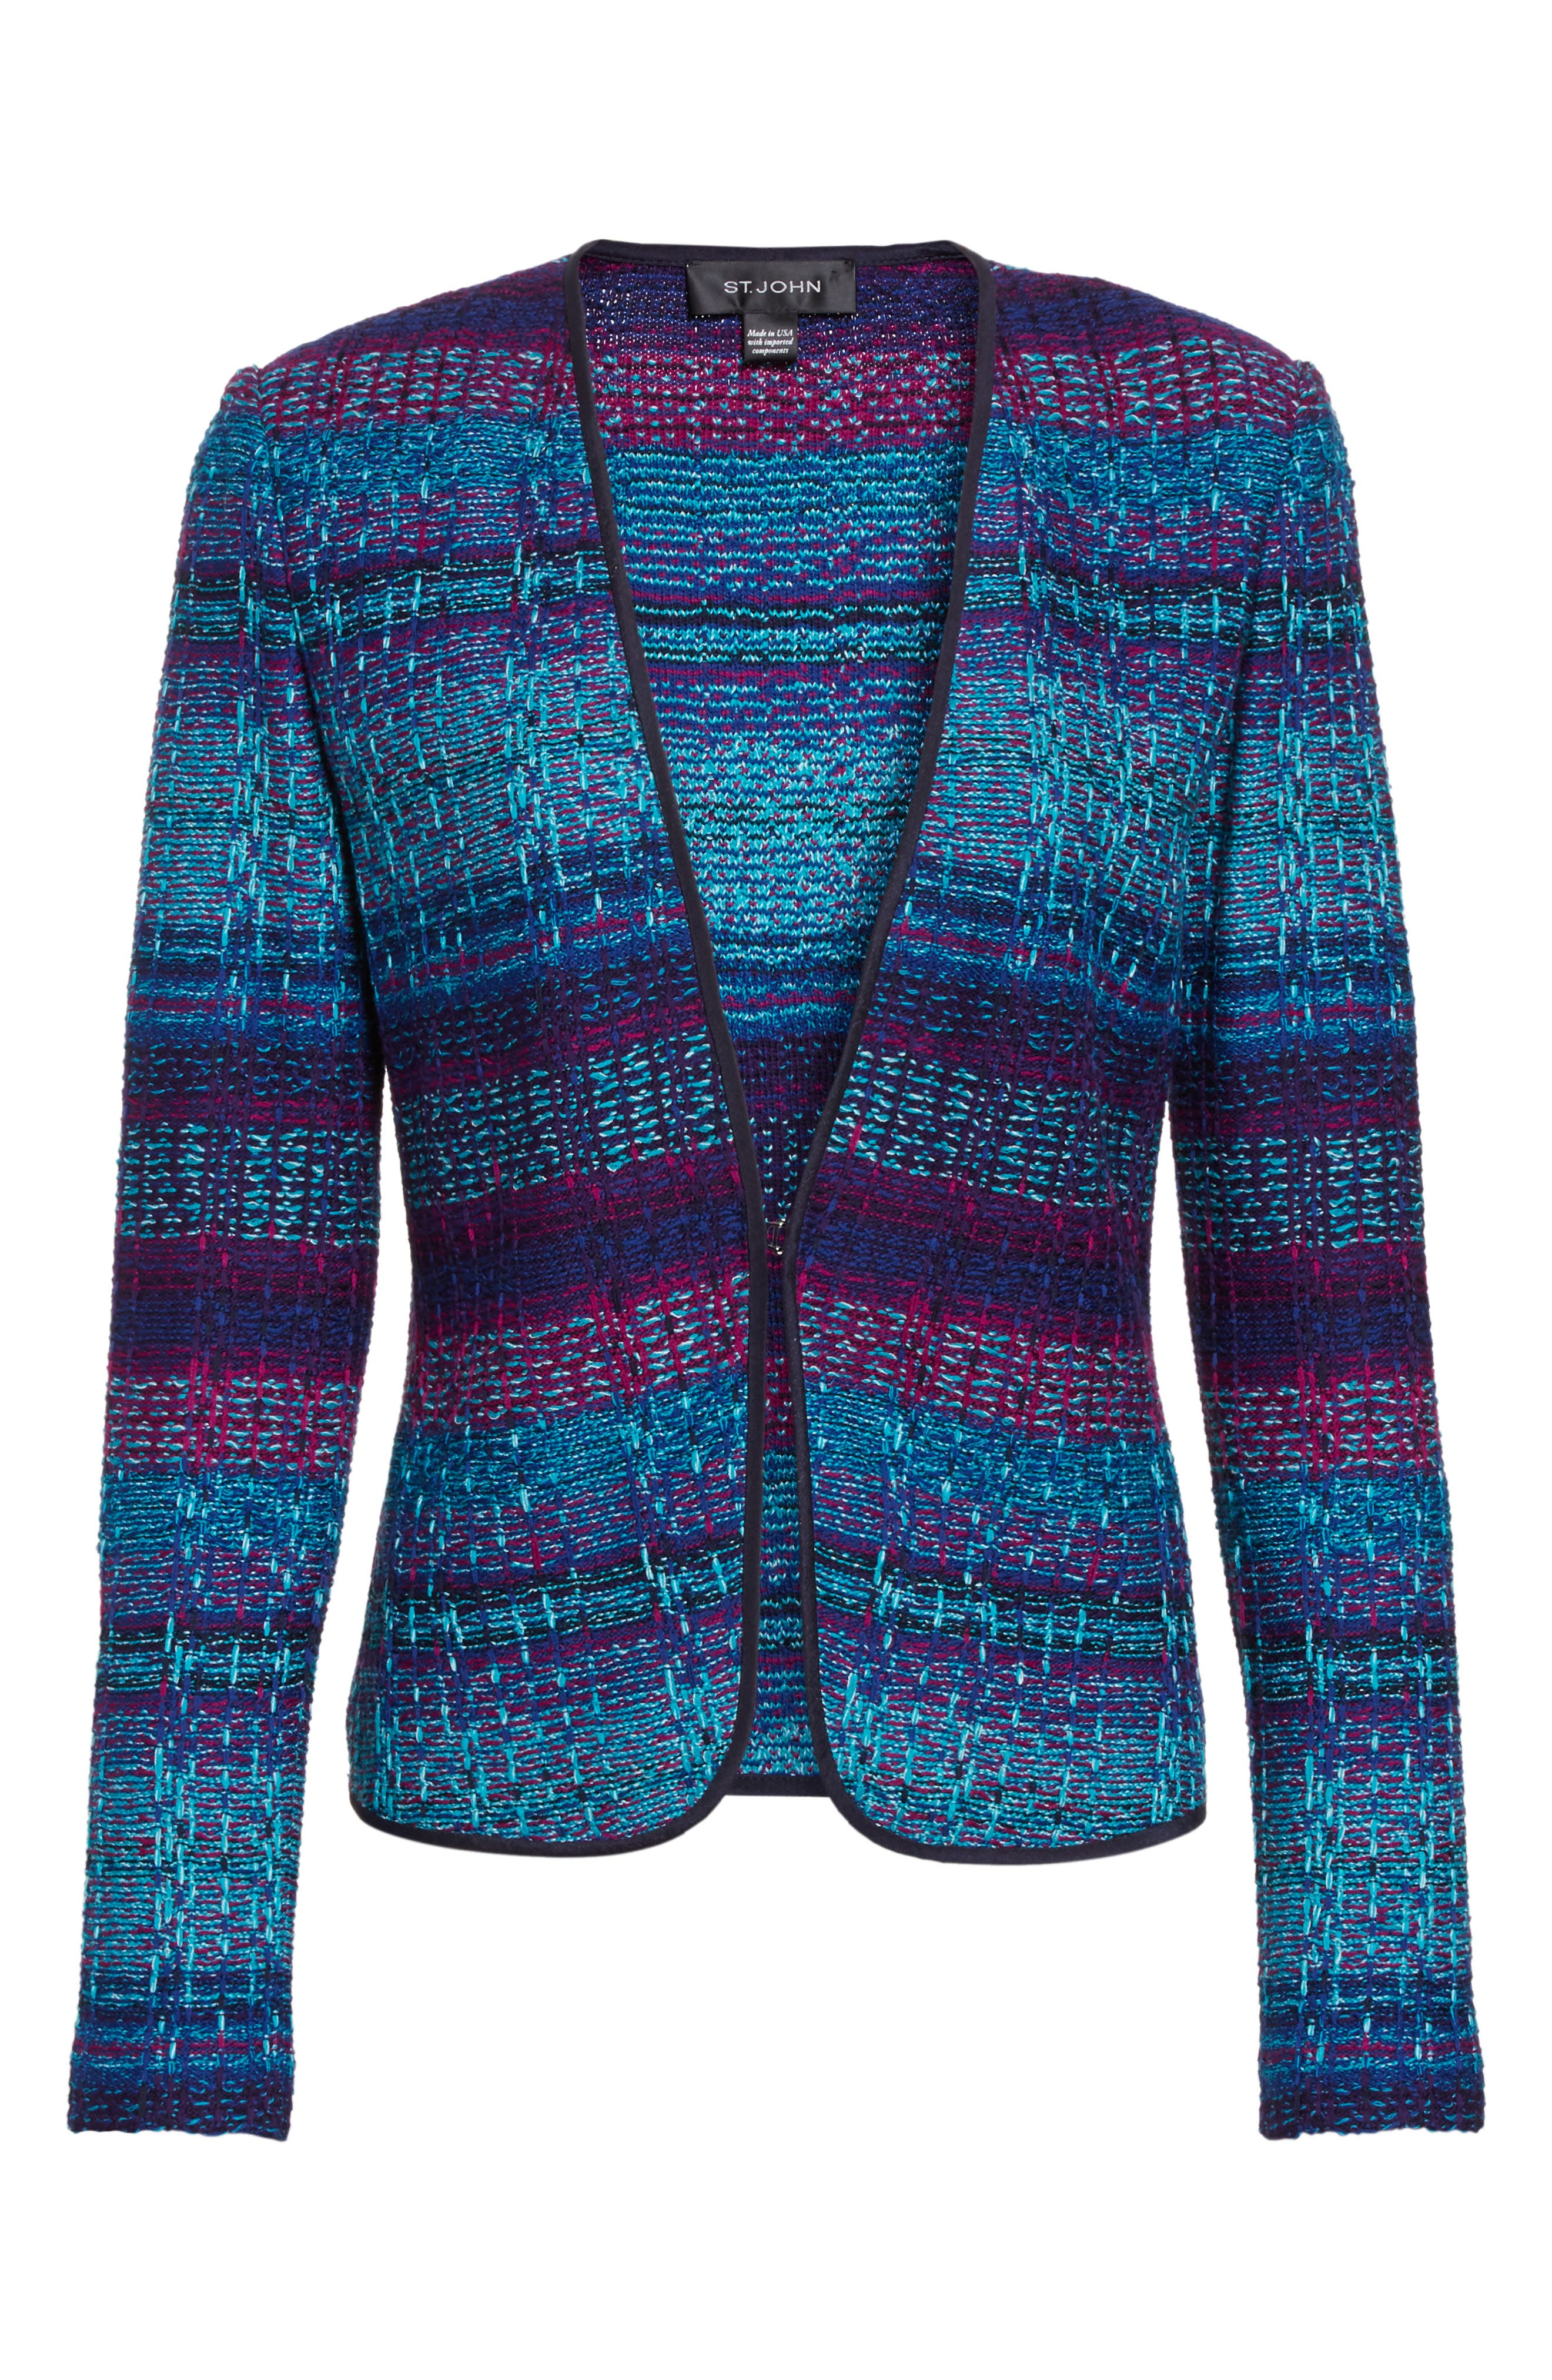 Ellah Knit Jacket,                             Alternate thumbnail 5, color,                             410